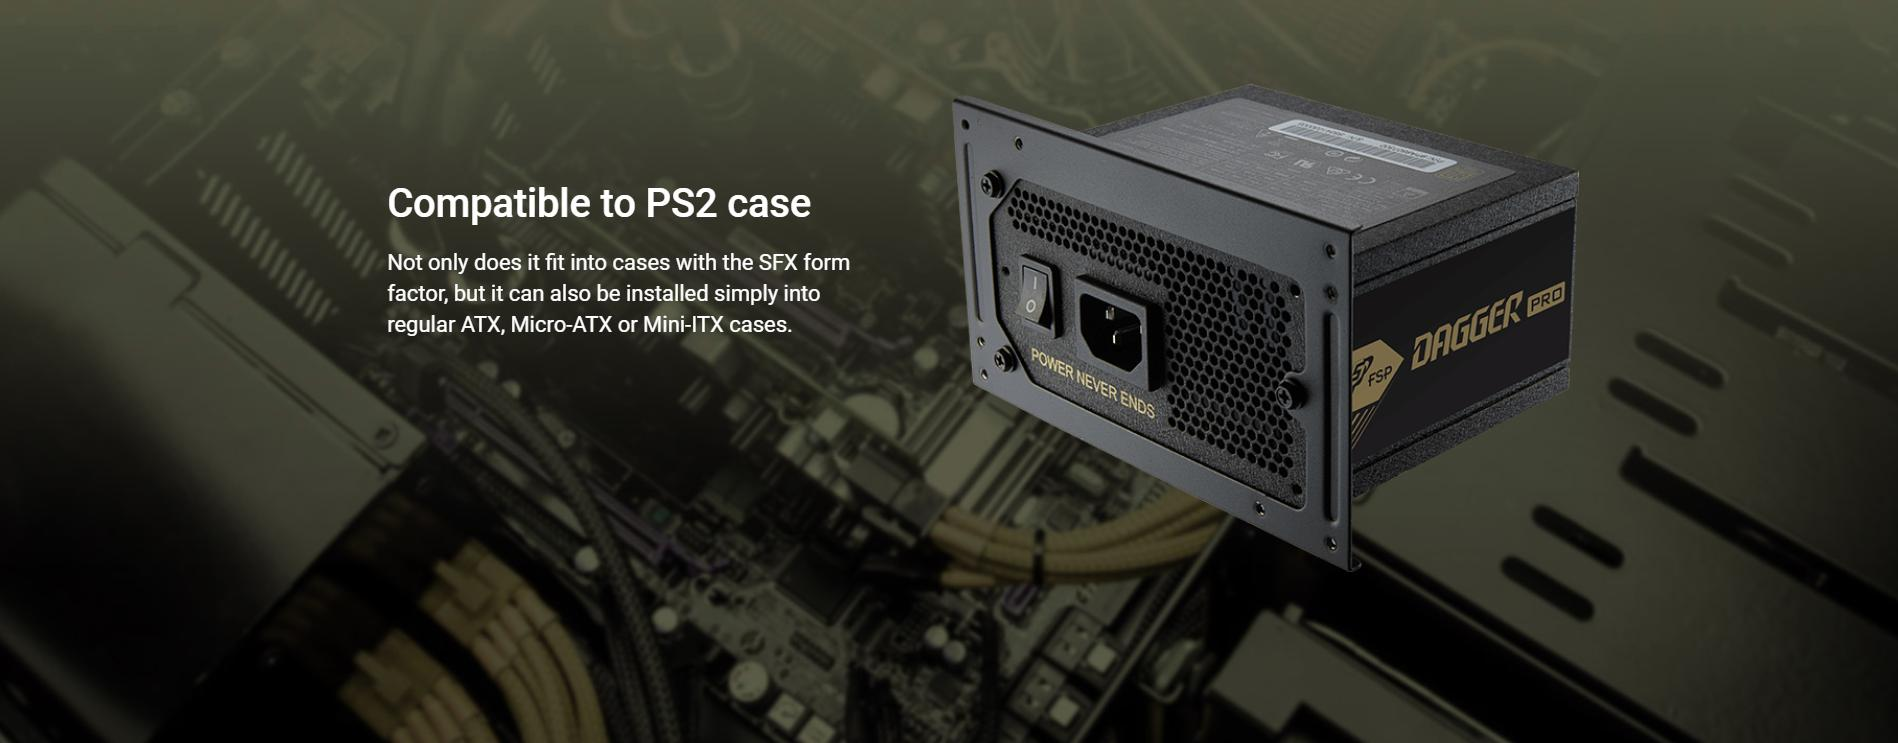 FSP Power Supply DAGGER PRO Series Model SDA2-650 - Active PFC (80 Plus Gold/Full Modular/Màu Đen/SFX) giới thiệu 7